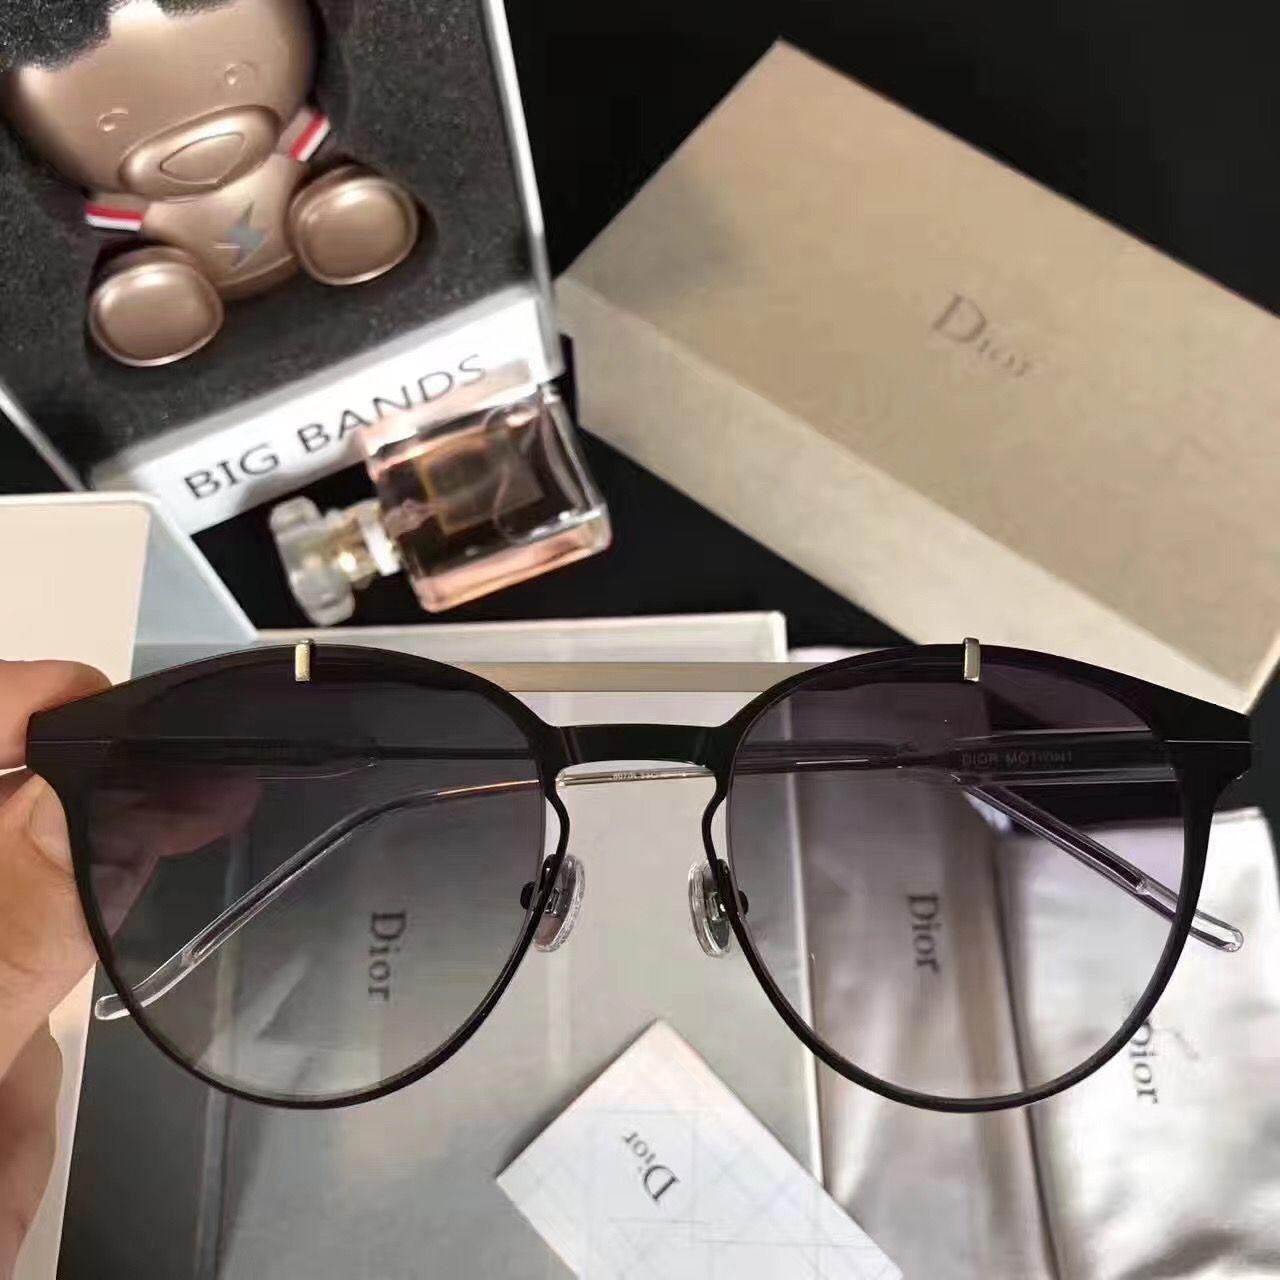 4f3babdc9 Dior sunglasses   sun glasses* v roku 2019   Sunglasses, Dior ...